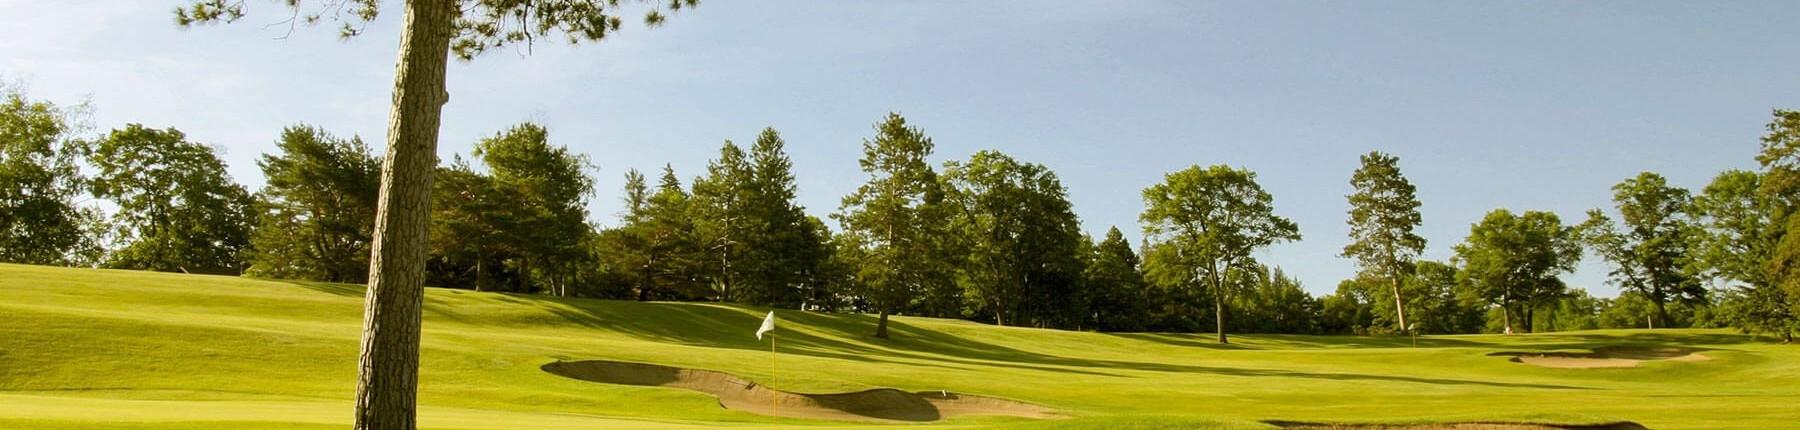 Madden's Gull Lake golf